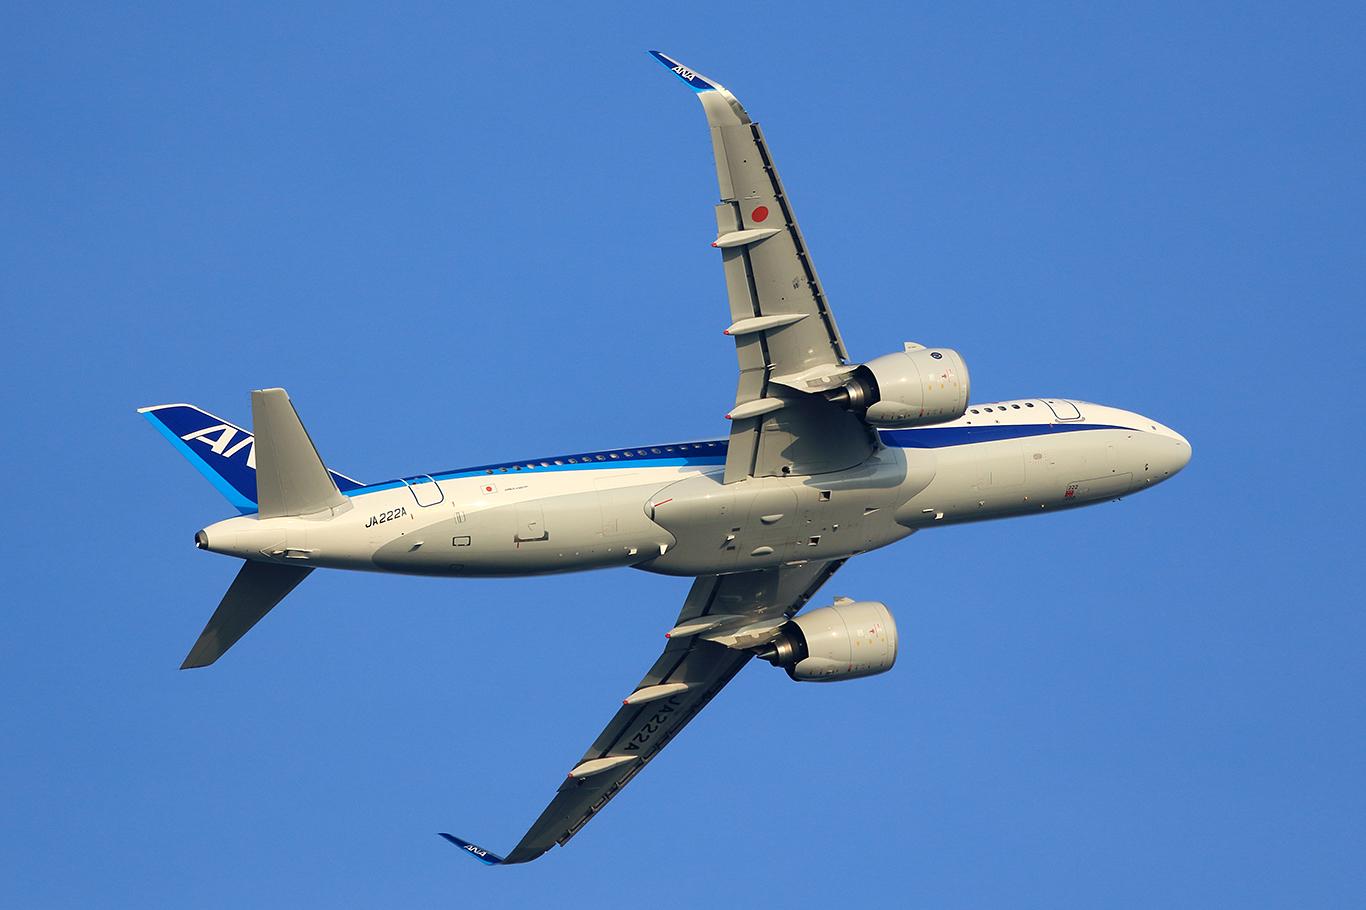 NH/ANA/全日空 NH537 A320Neo JA222A